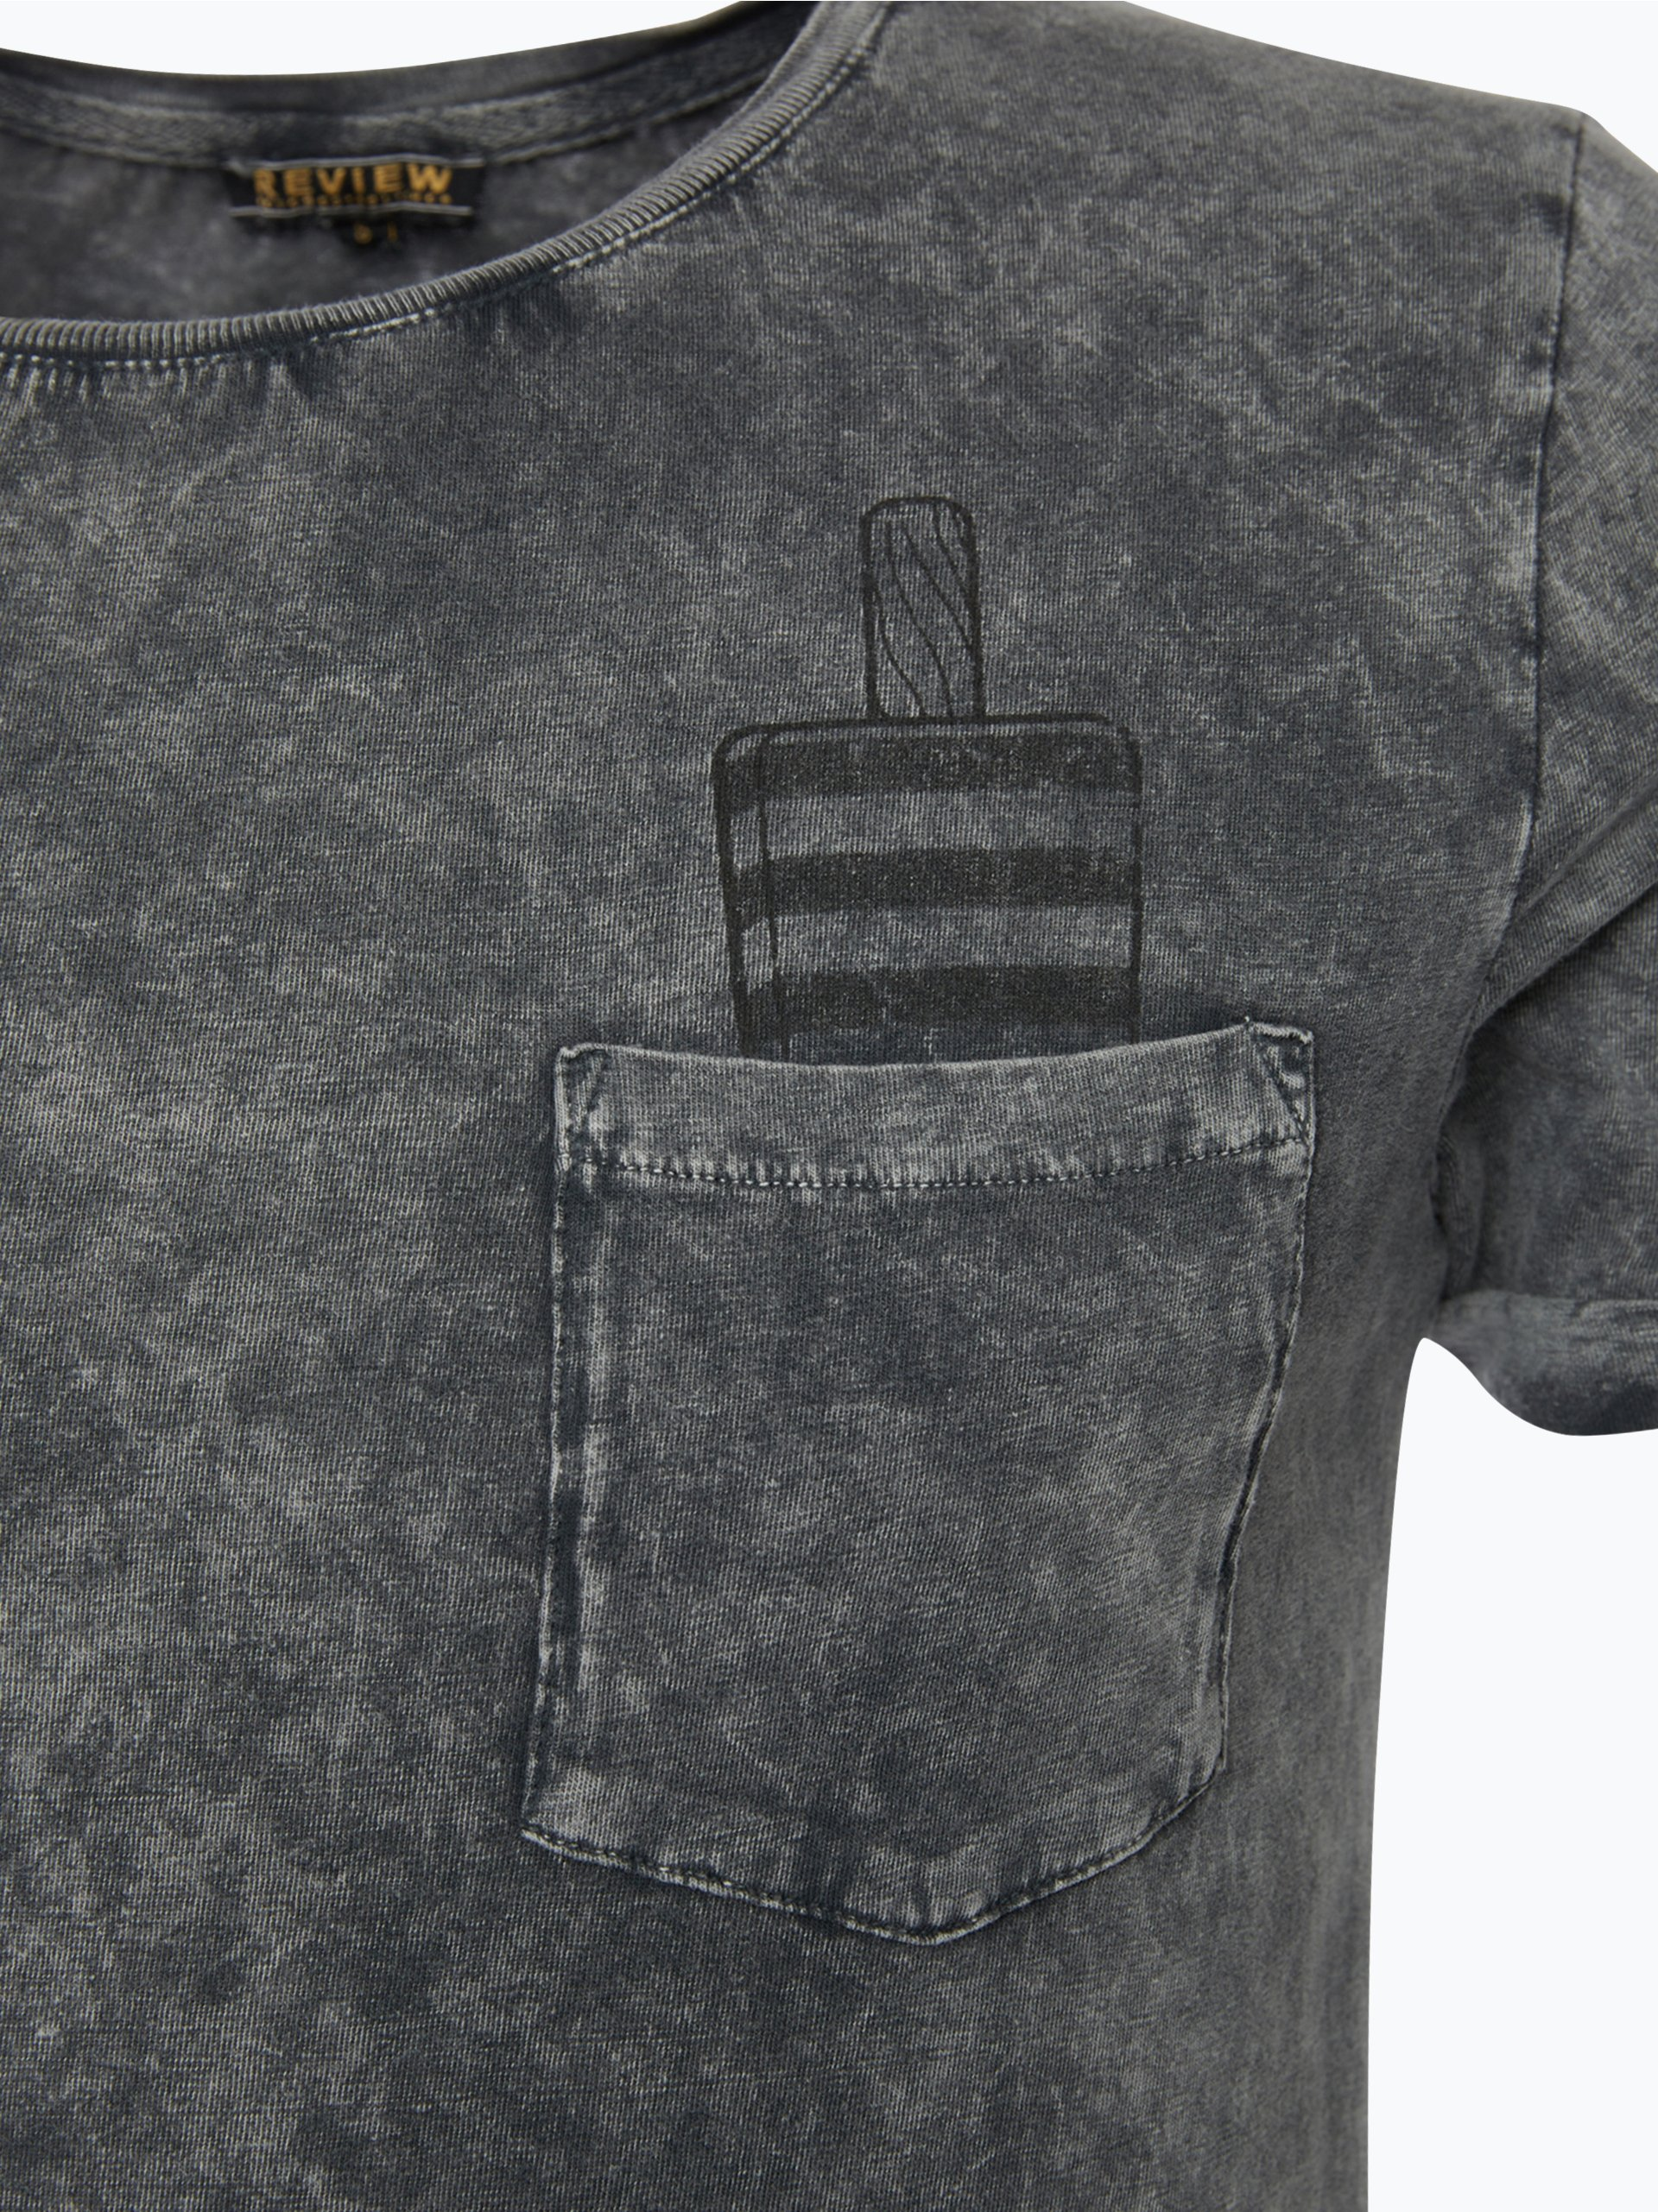 review herren t shirt grau gemustert online kaufen vangraaf com. Black Bedroom Furniture Sets. Home Design Ideas